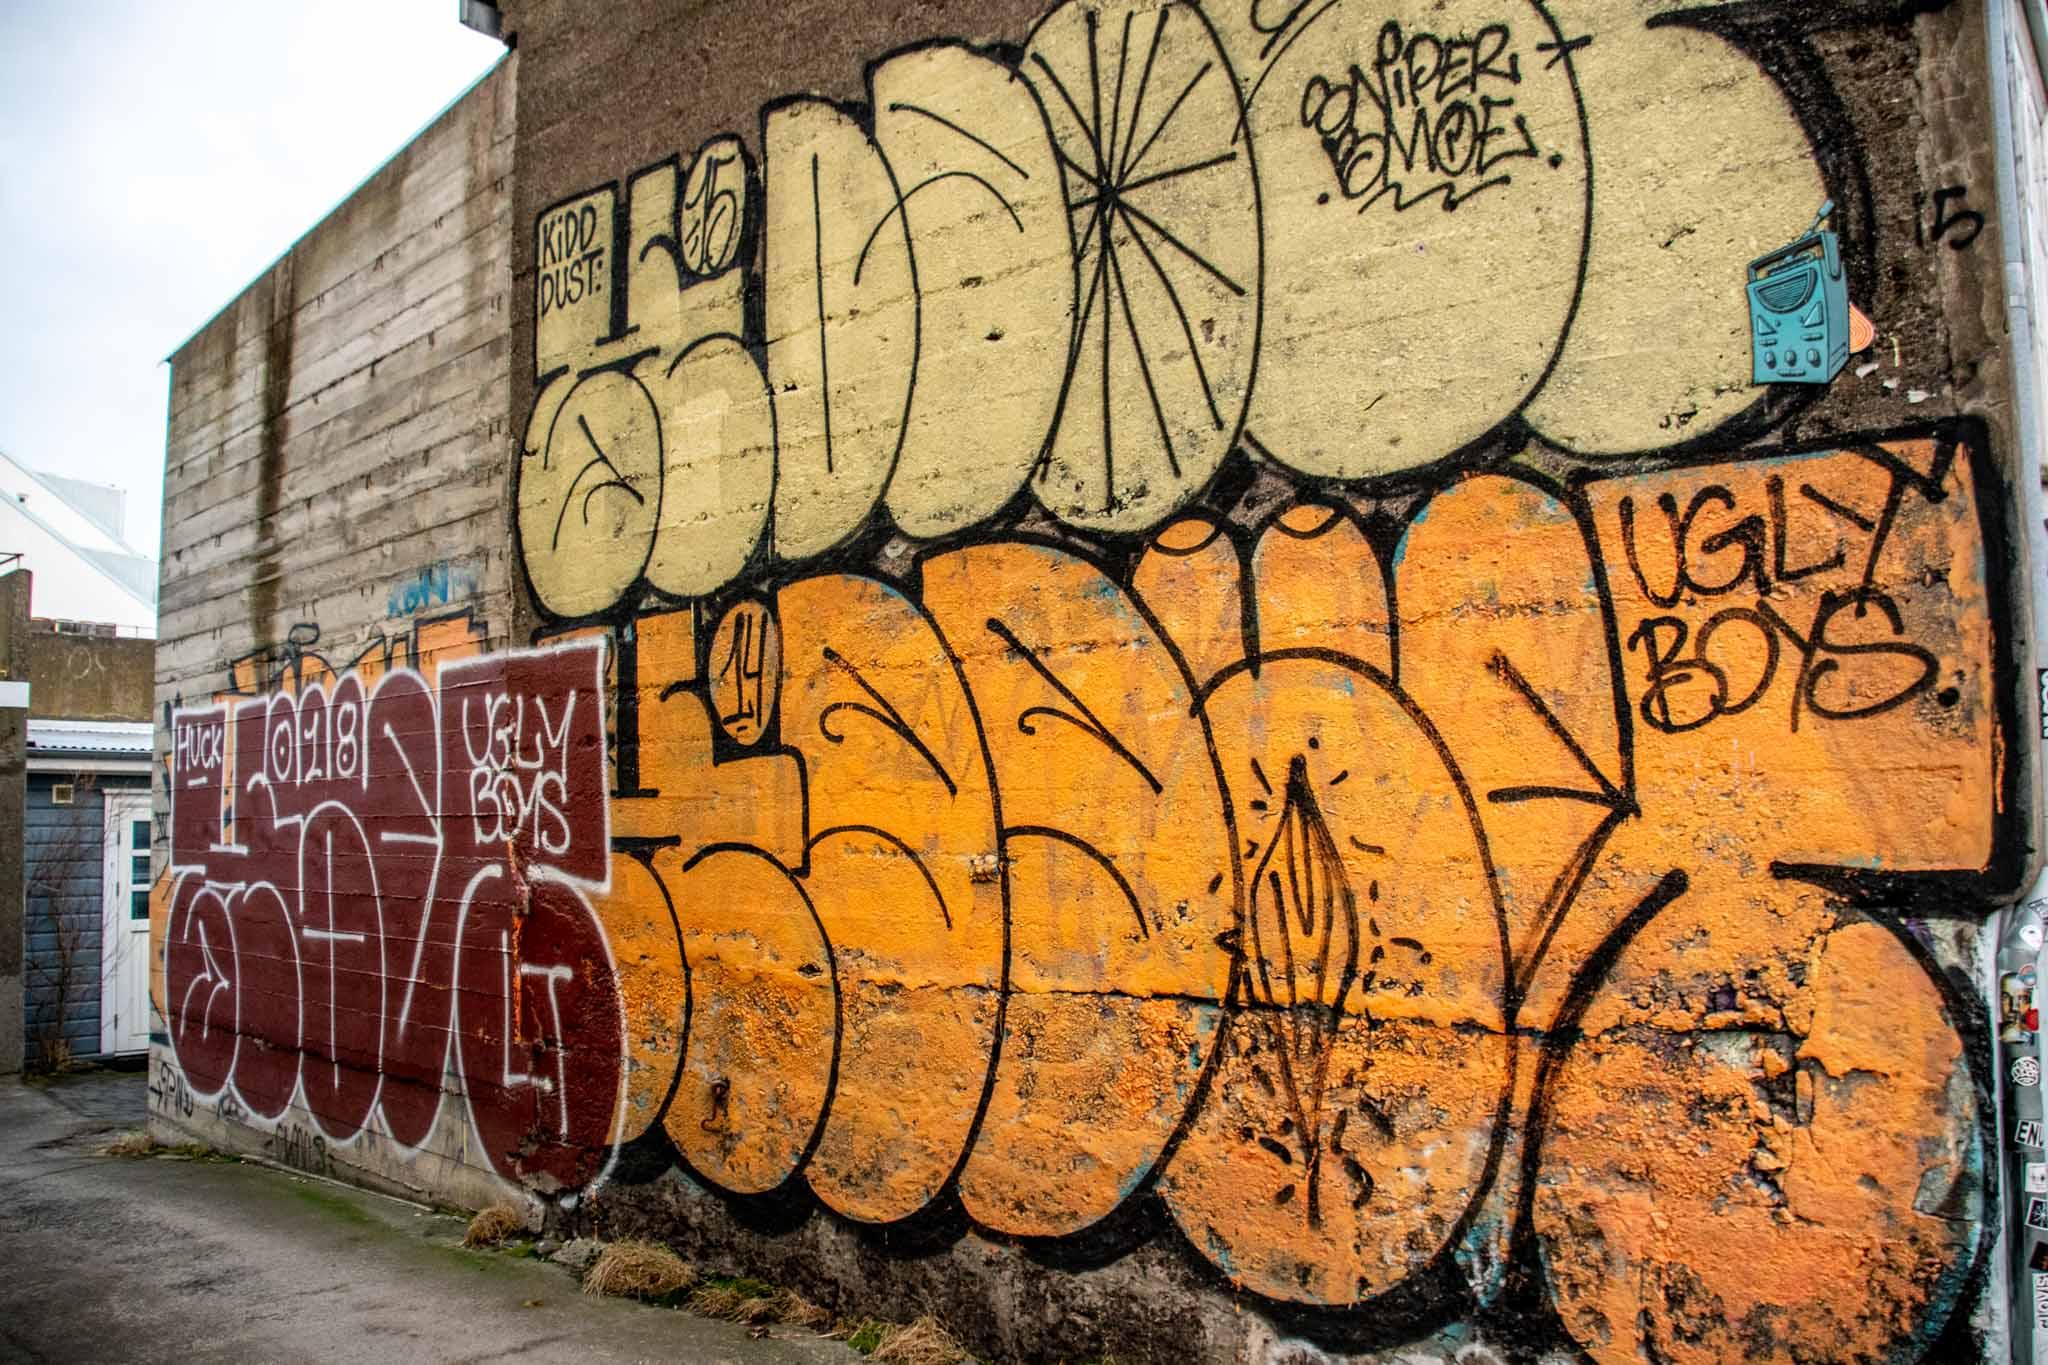 Bubble style street graffiti in Reykjavik by the Ugly Boys